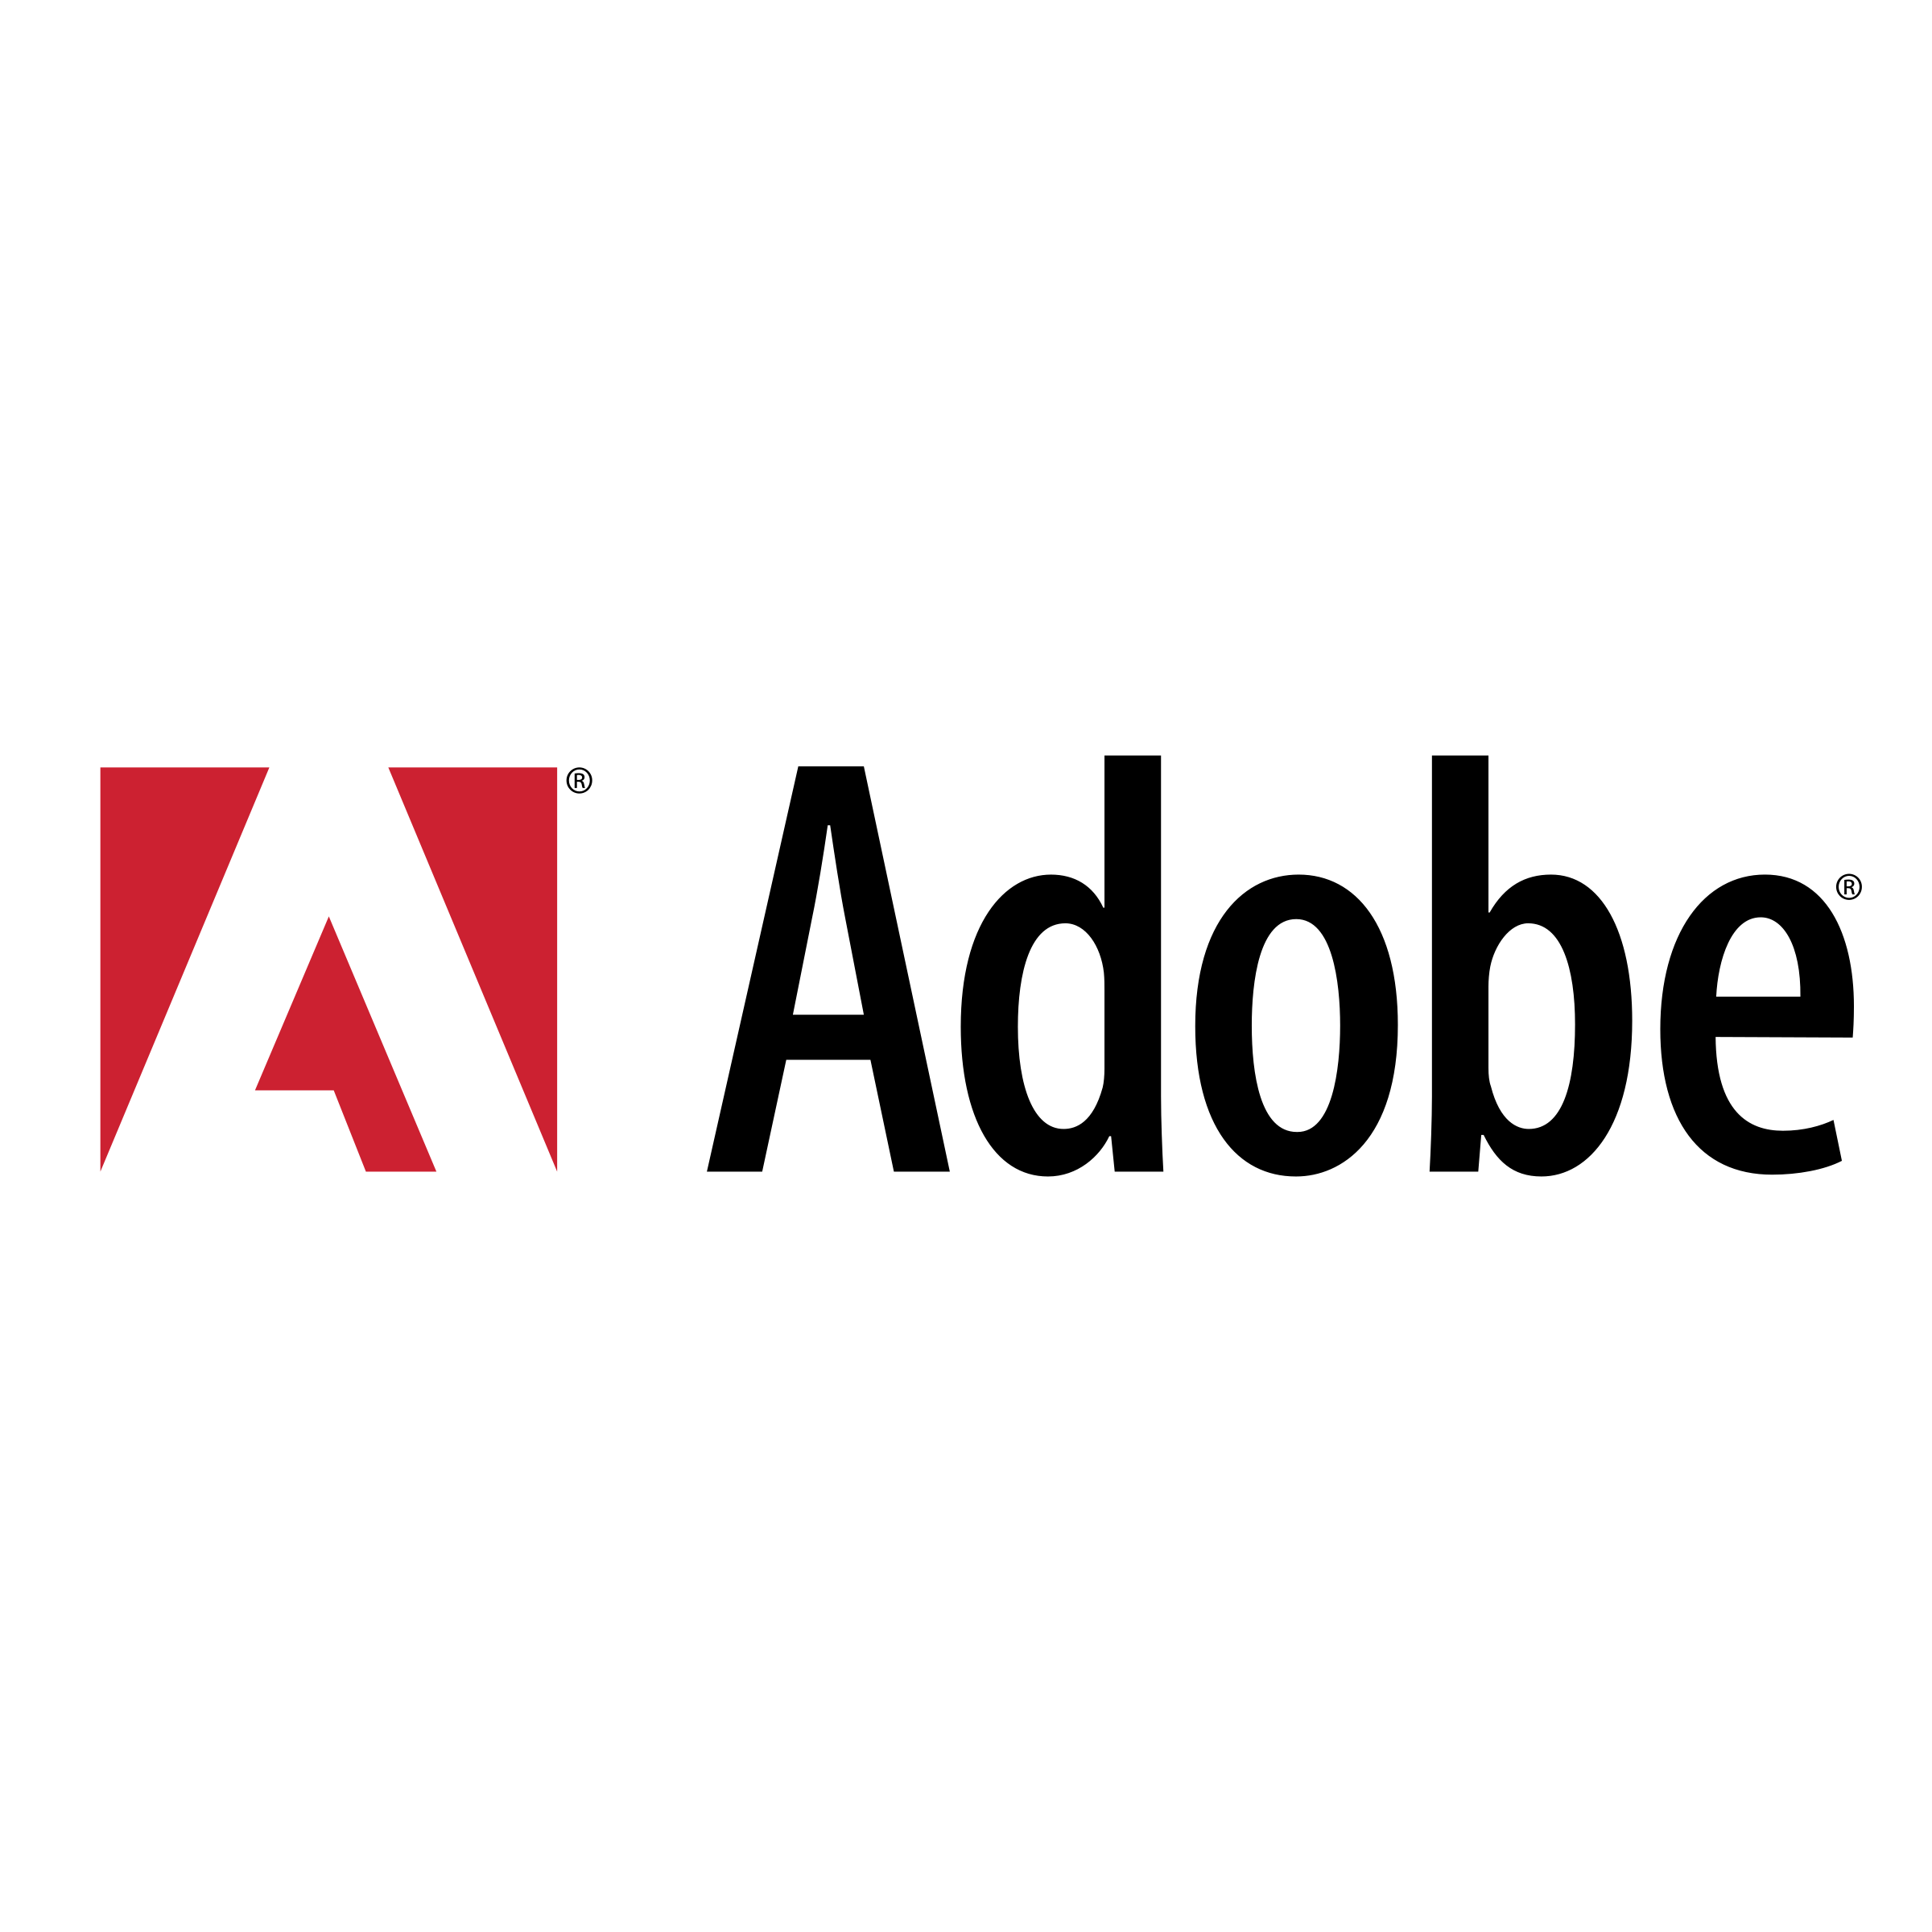 adobe-01-logo-png-transparent.png